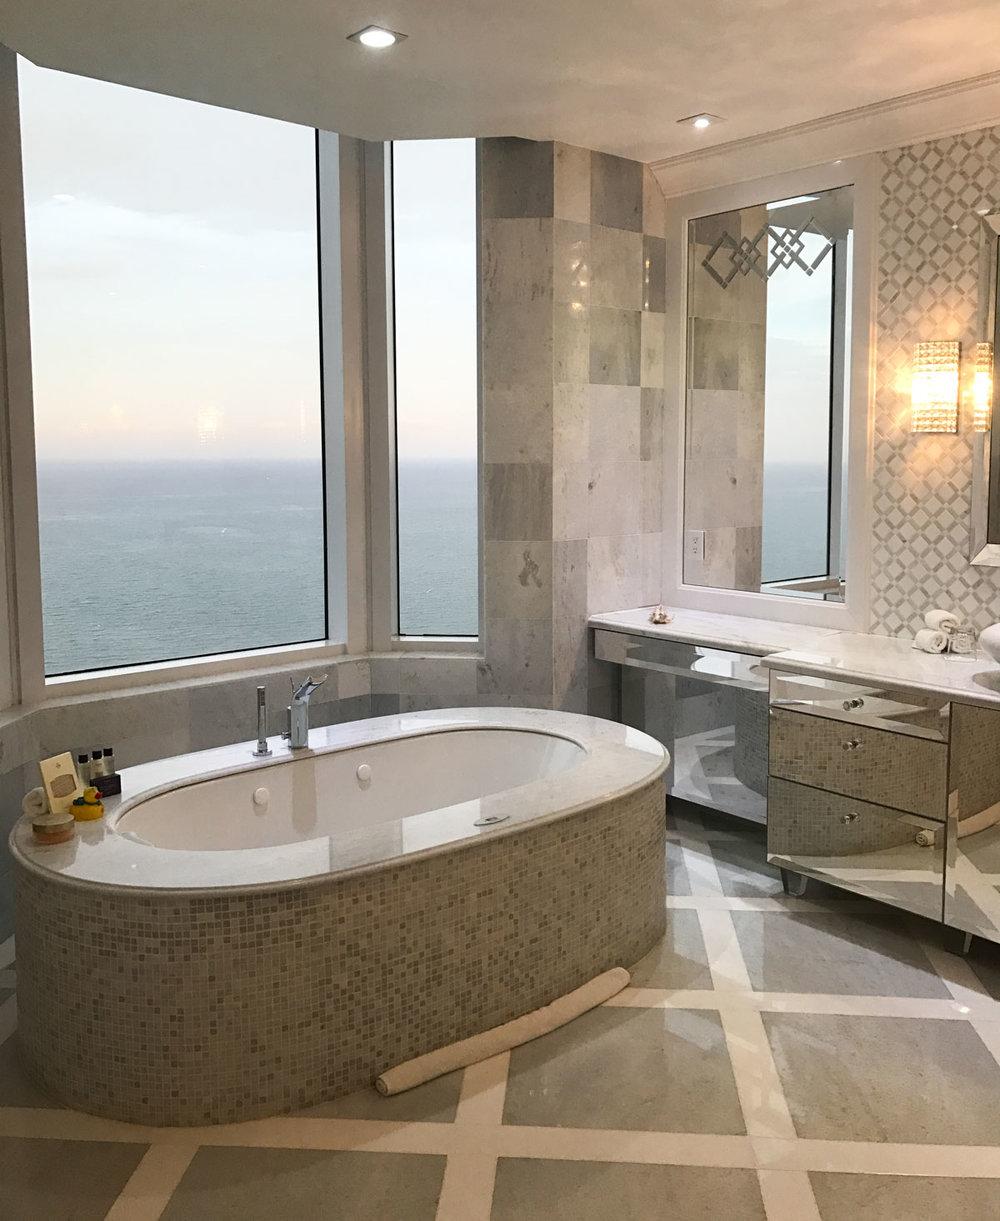 Acqualina Resort Reviews_AddieBell_Best_US_Getaway-8616.jpg